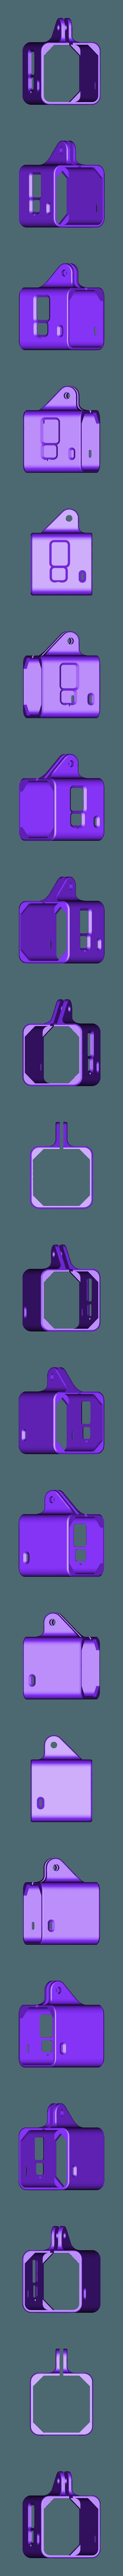 Mokacam box frame extended.stl Download free STL file Mokacam Frame • 3D print model, Stamos